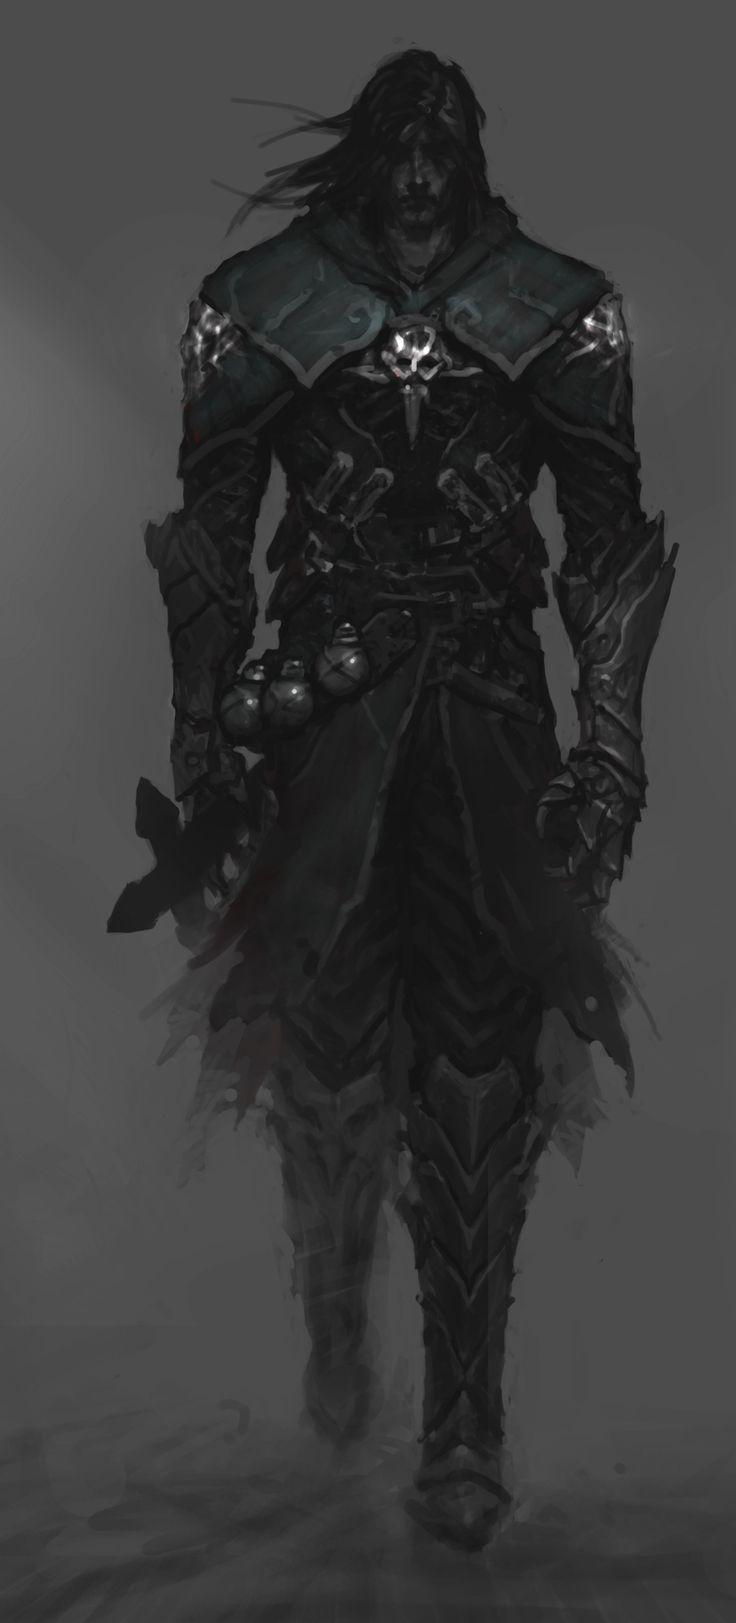 Castlevania: Lords Of Shadow Wallpaper Gabriel Artwork Wallpaper